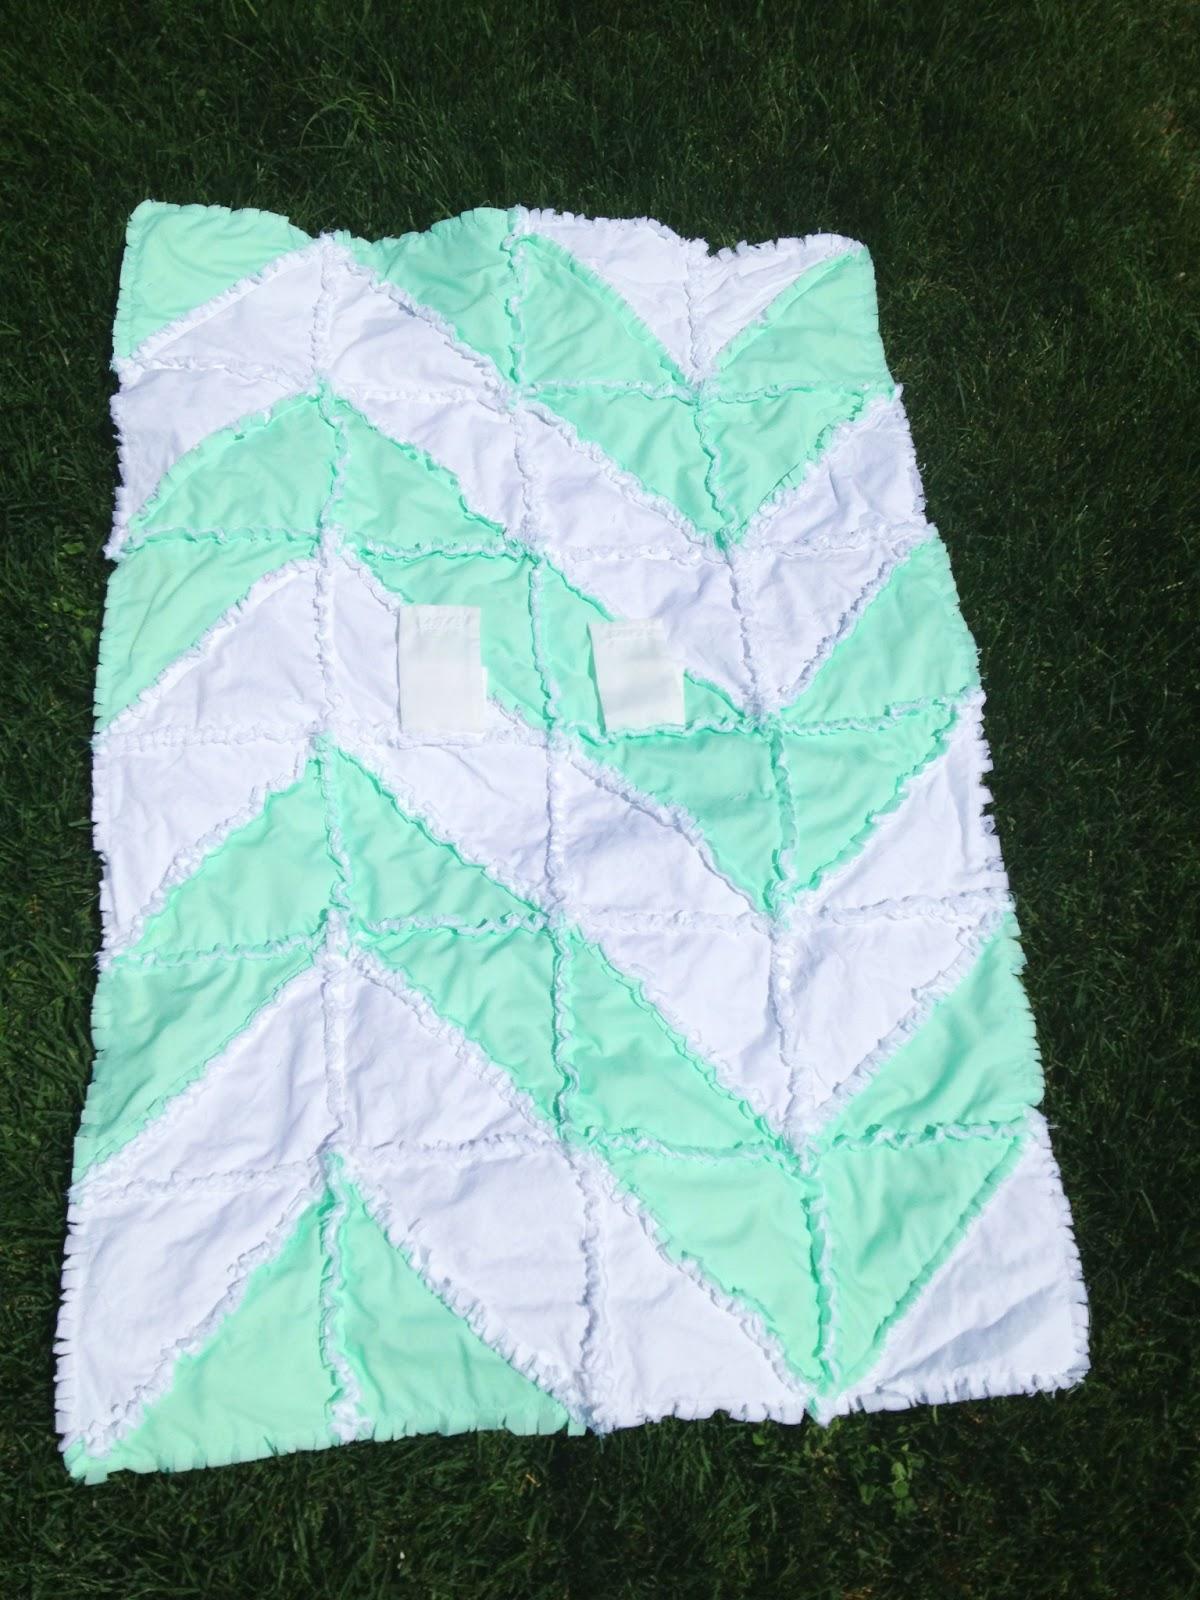 Free Chevron Rag Quilt Pattern With Bonus Car Seat Tent Instructions